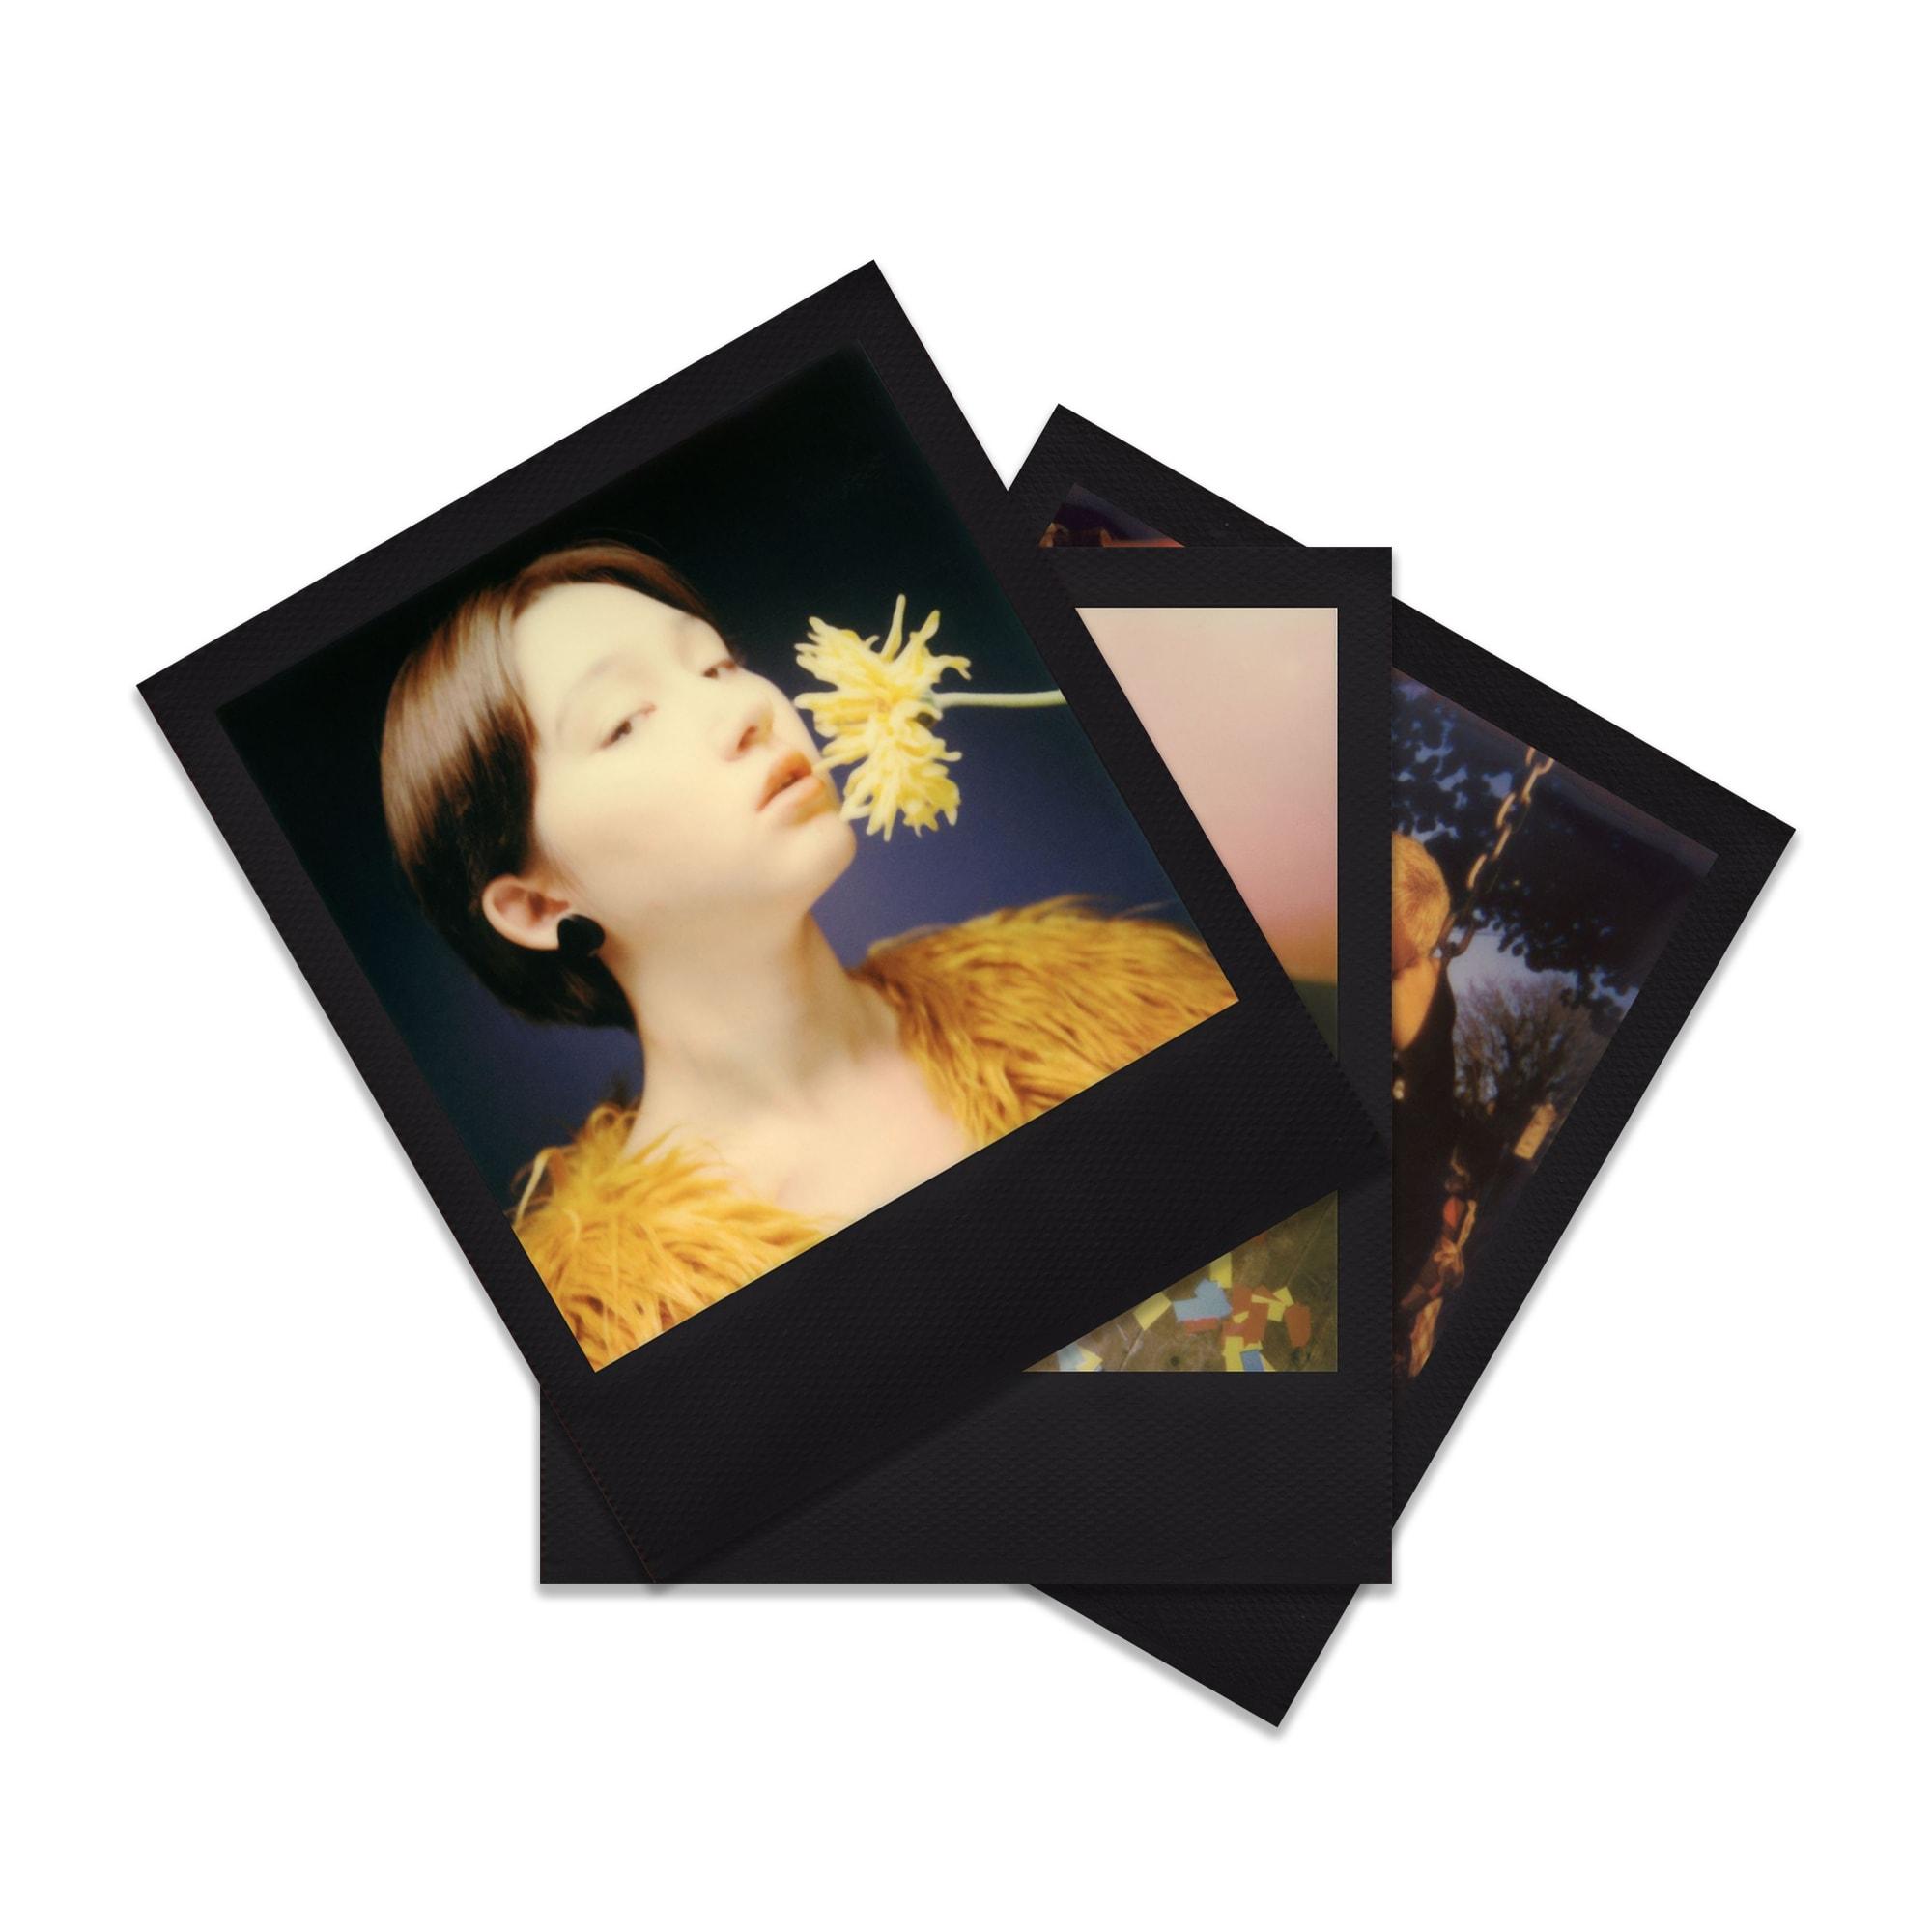 Polaroid I-Type Film Färg Black Frame Edition